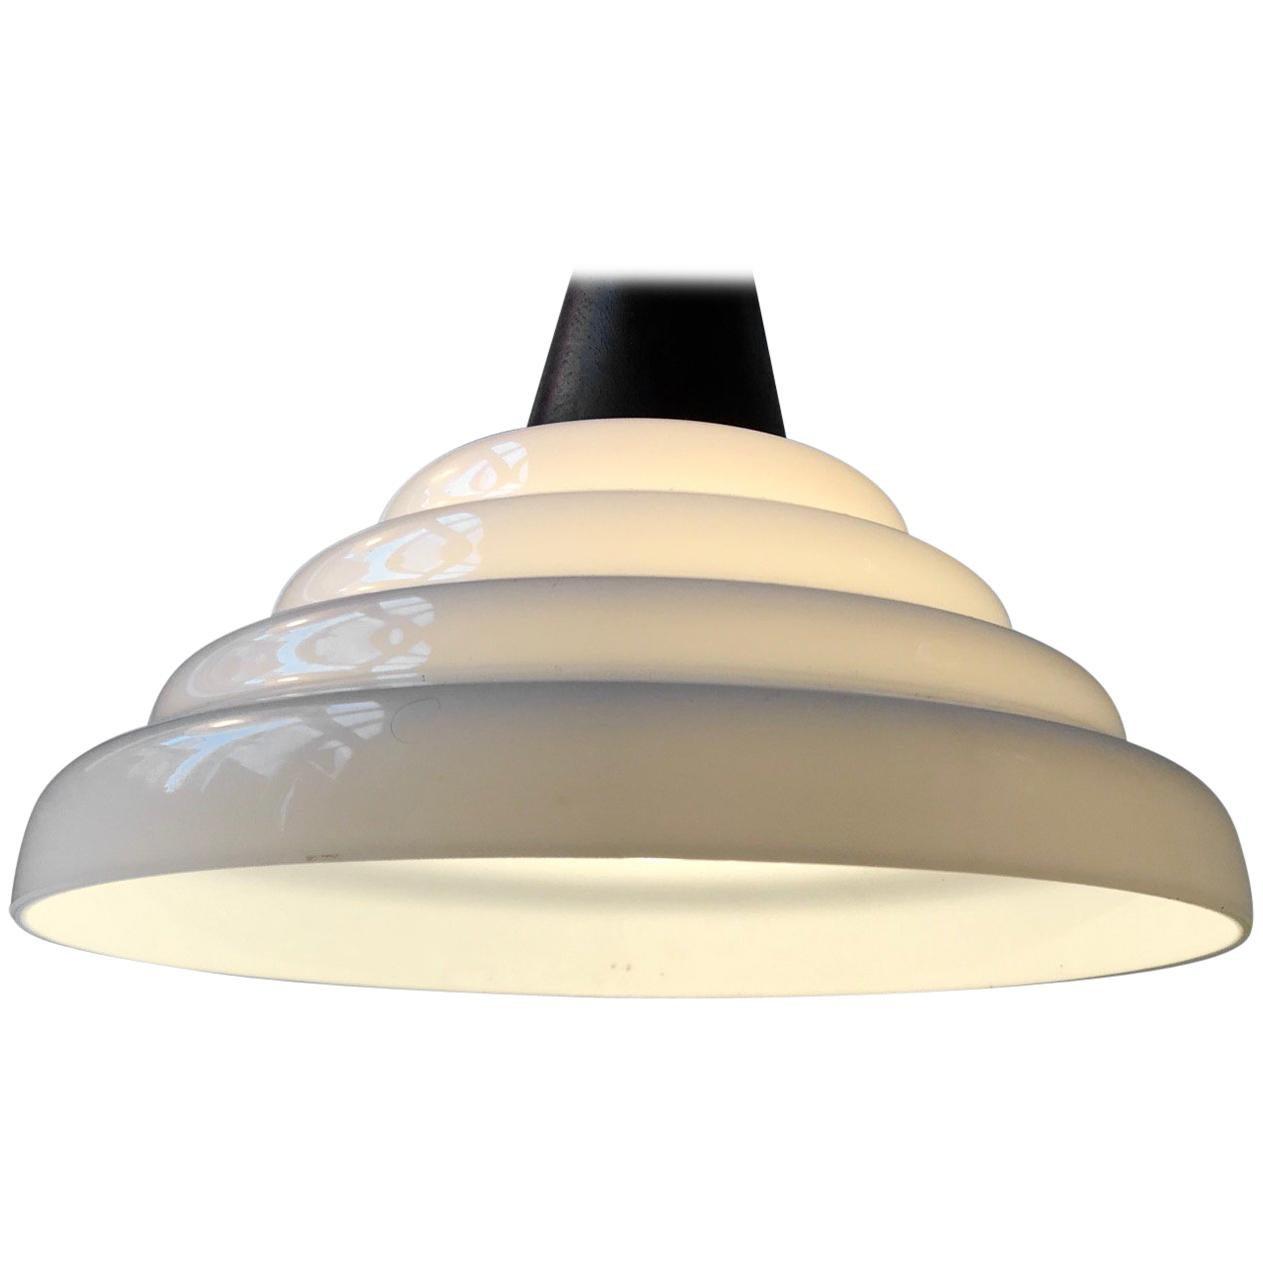 Midcentury Swedish Teak and White Cased Glass Pendant Light, 1960s